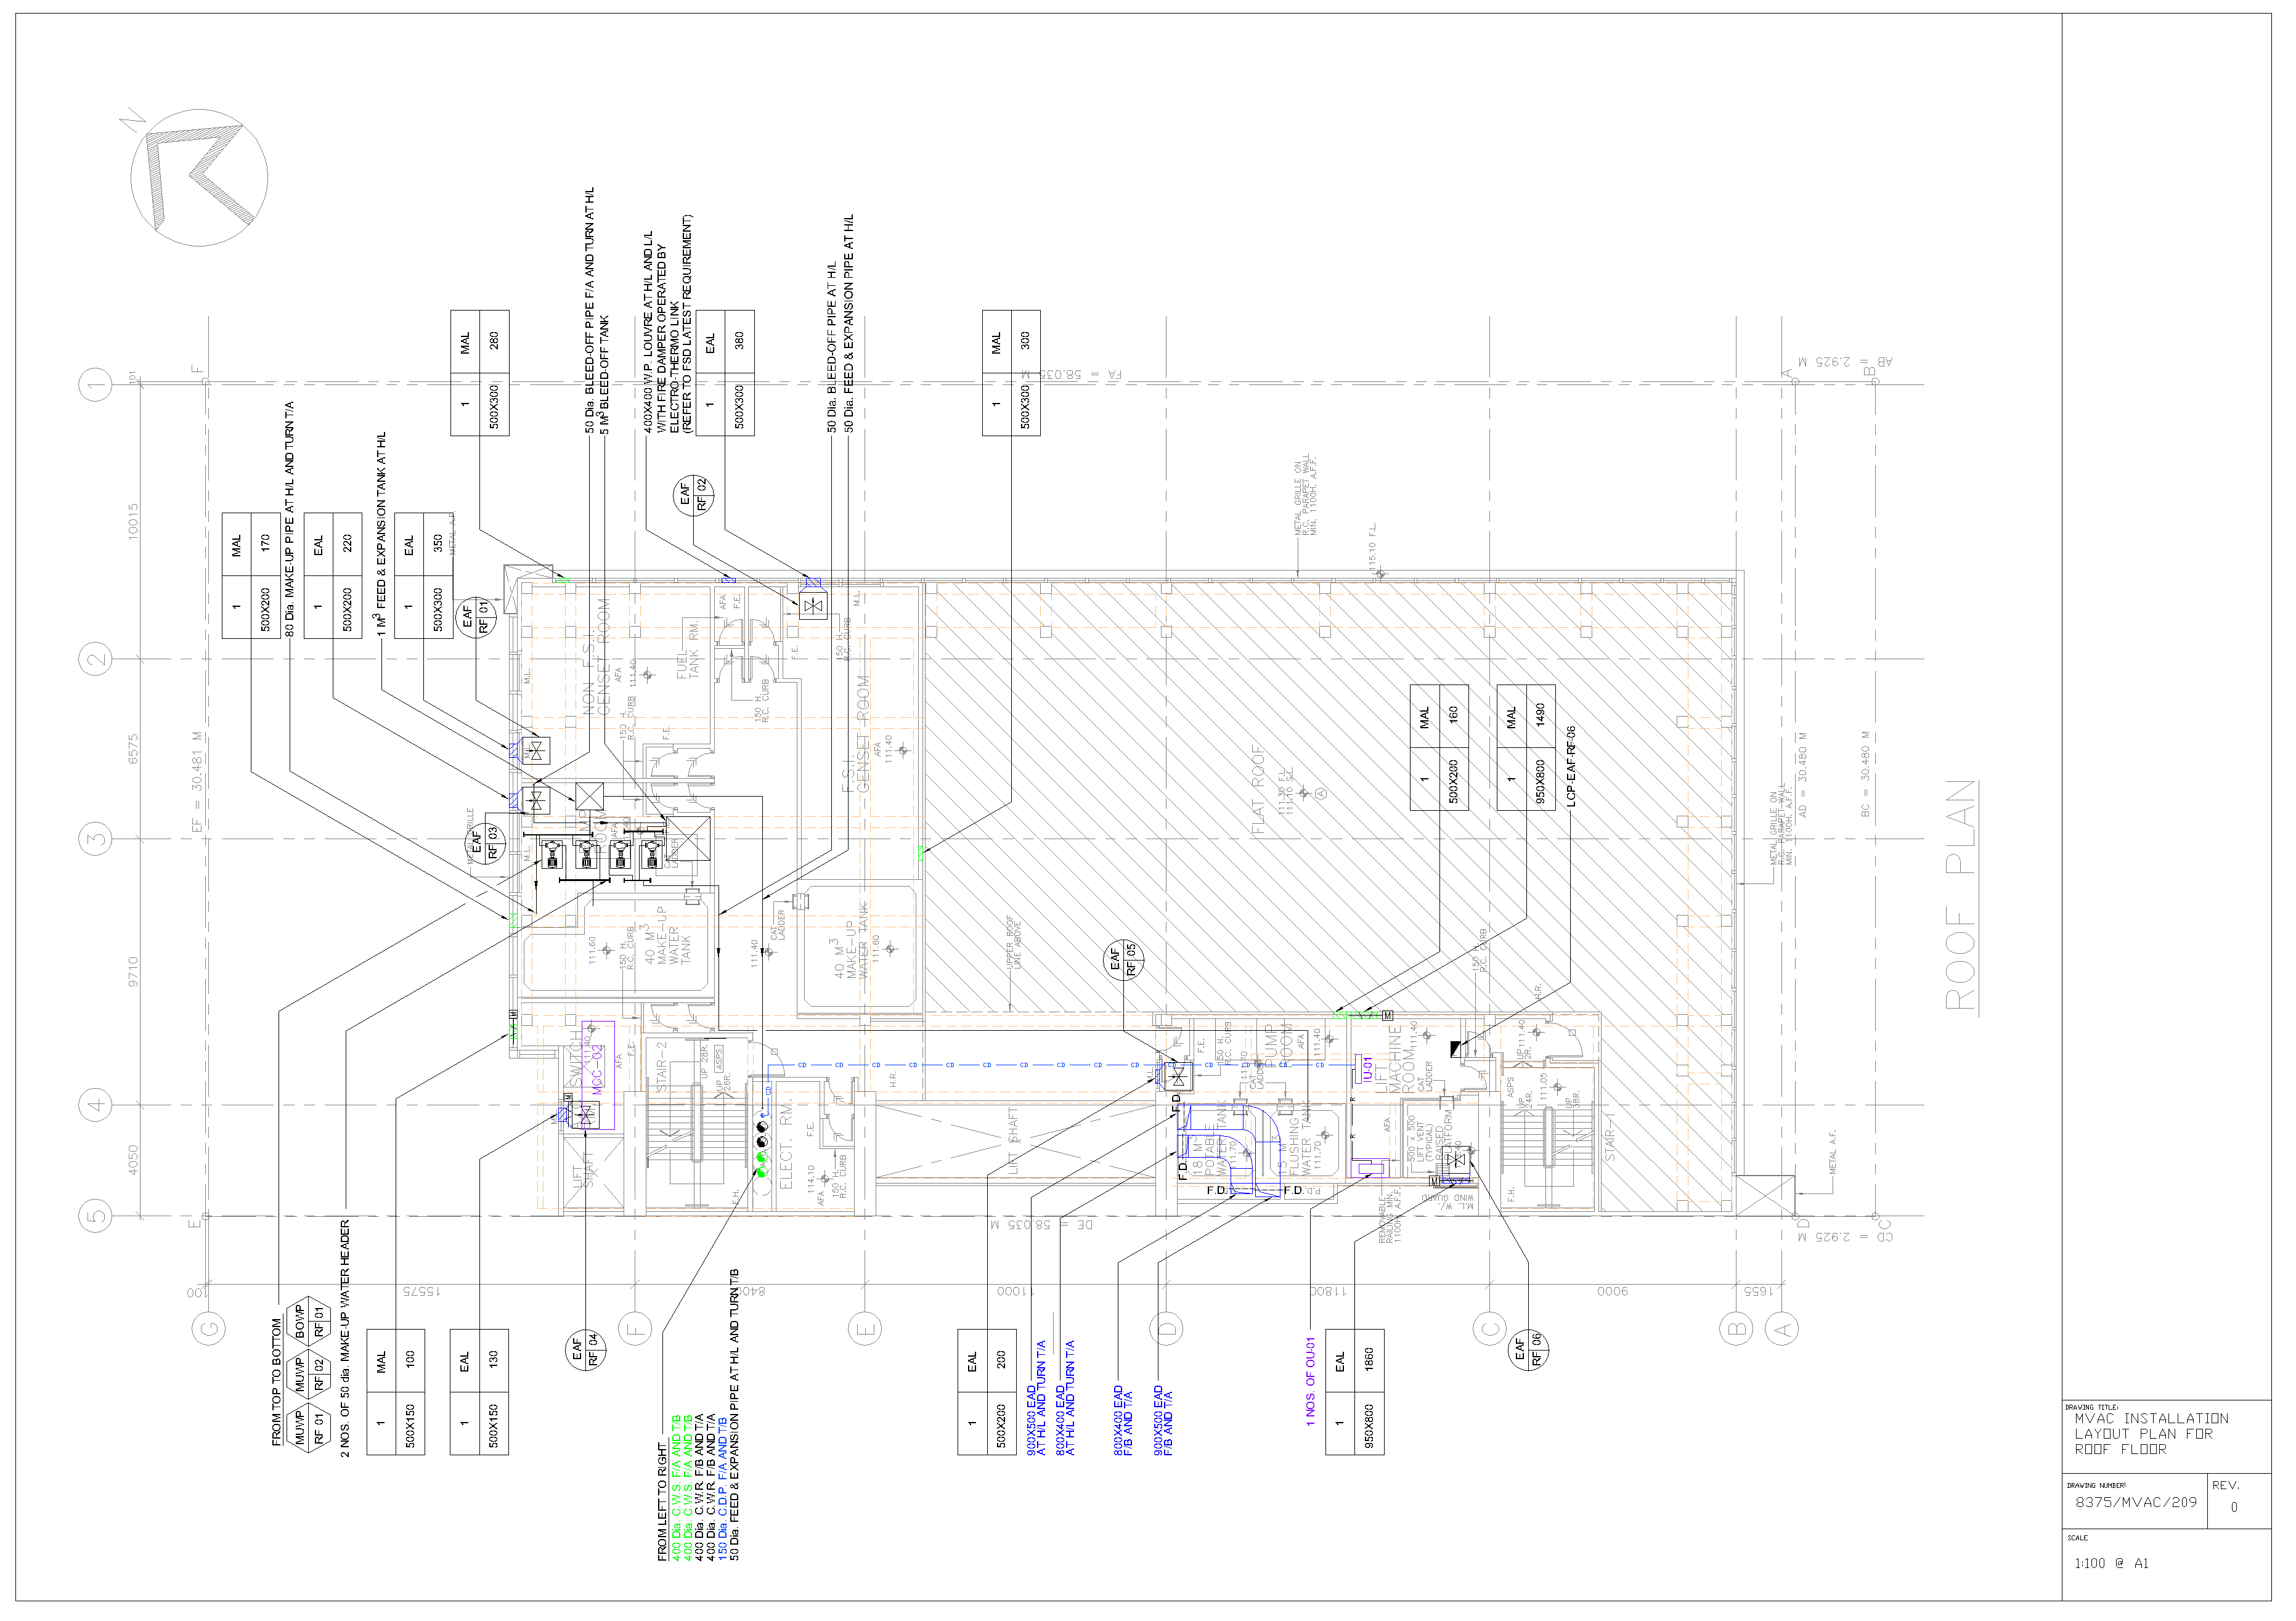 Alan Fong Piping Layout Drawings Download Pdf File